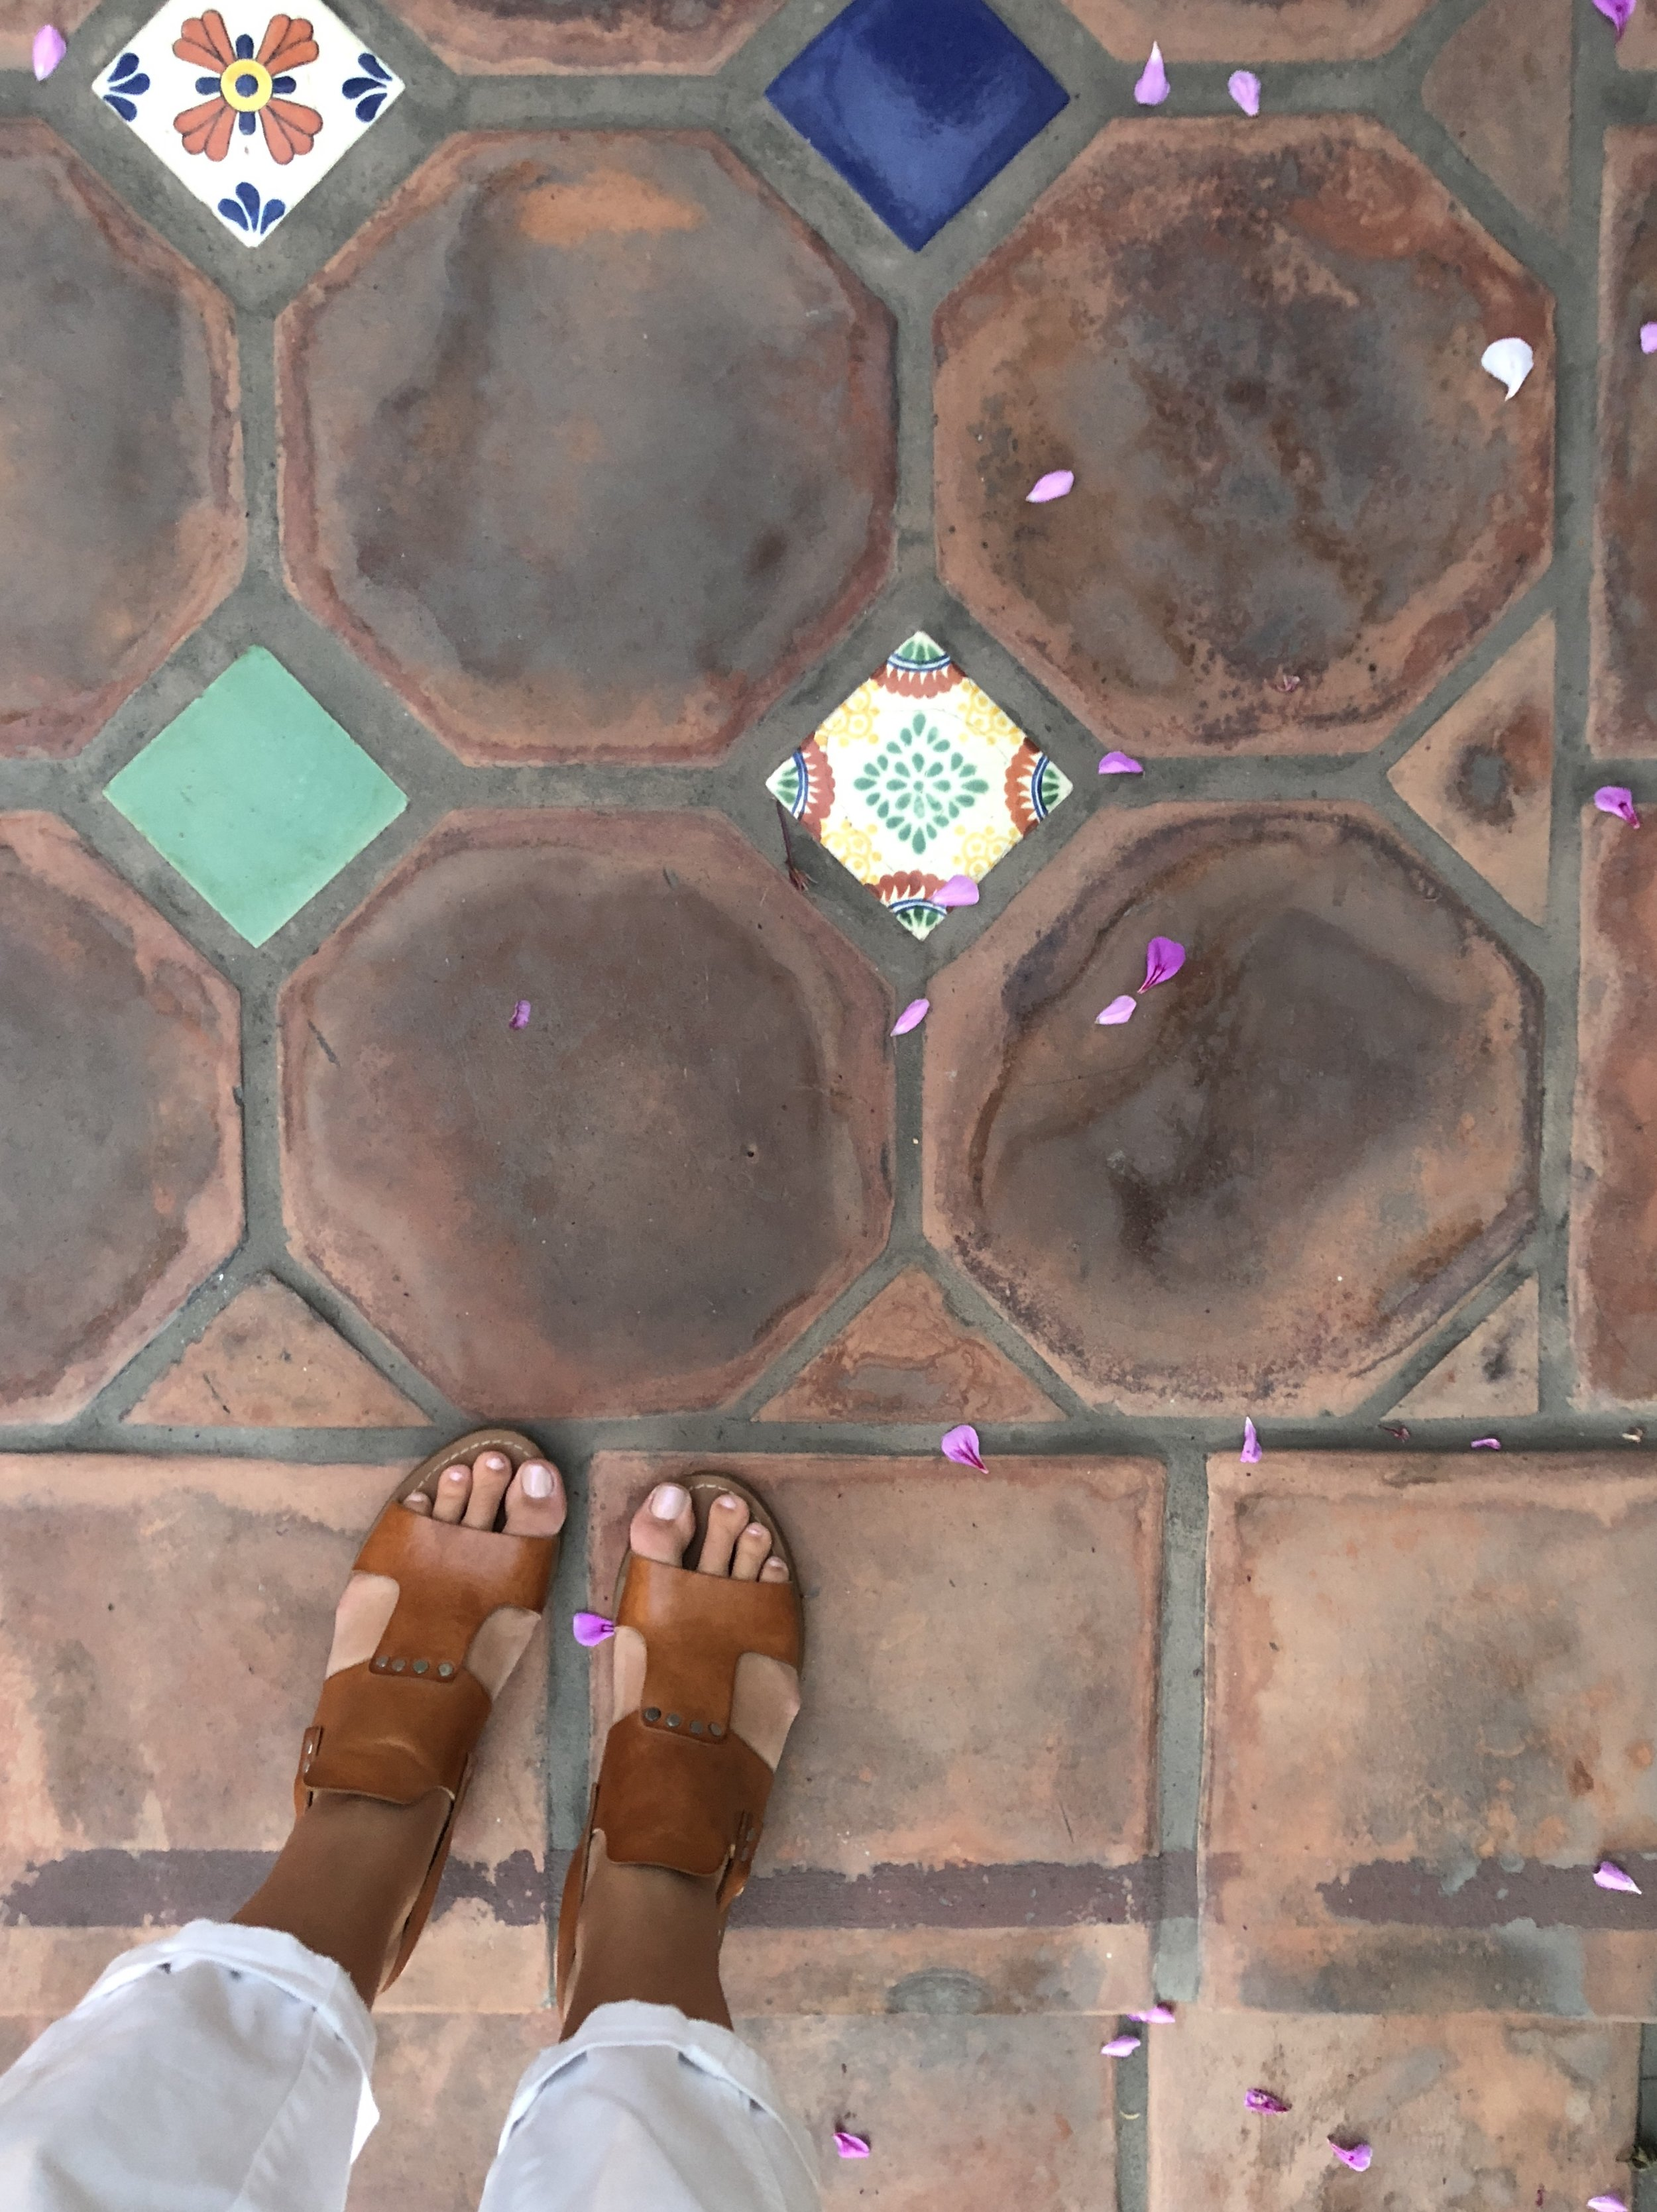 casa laguna's courtyard tiles